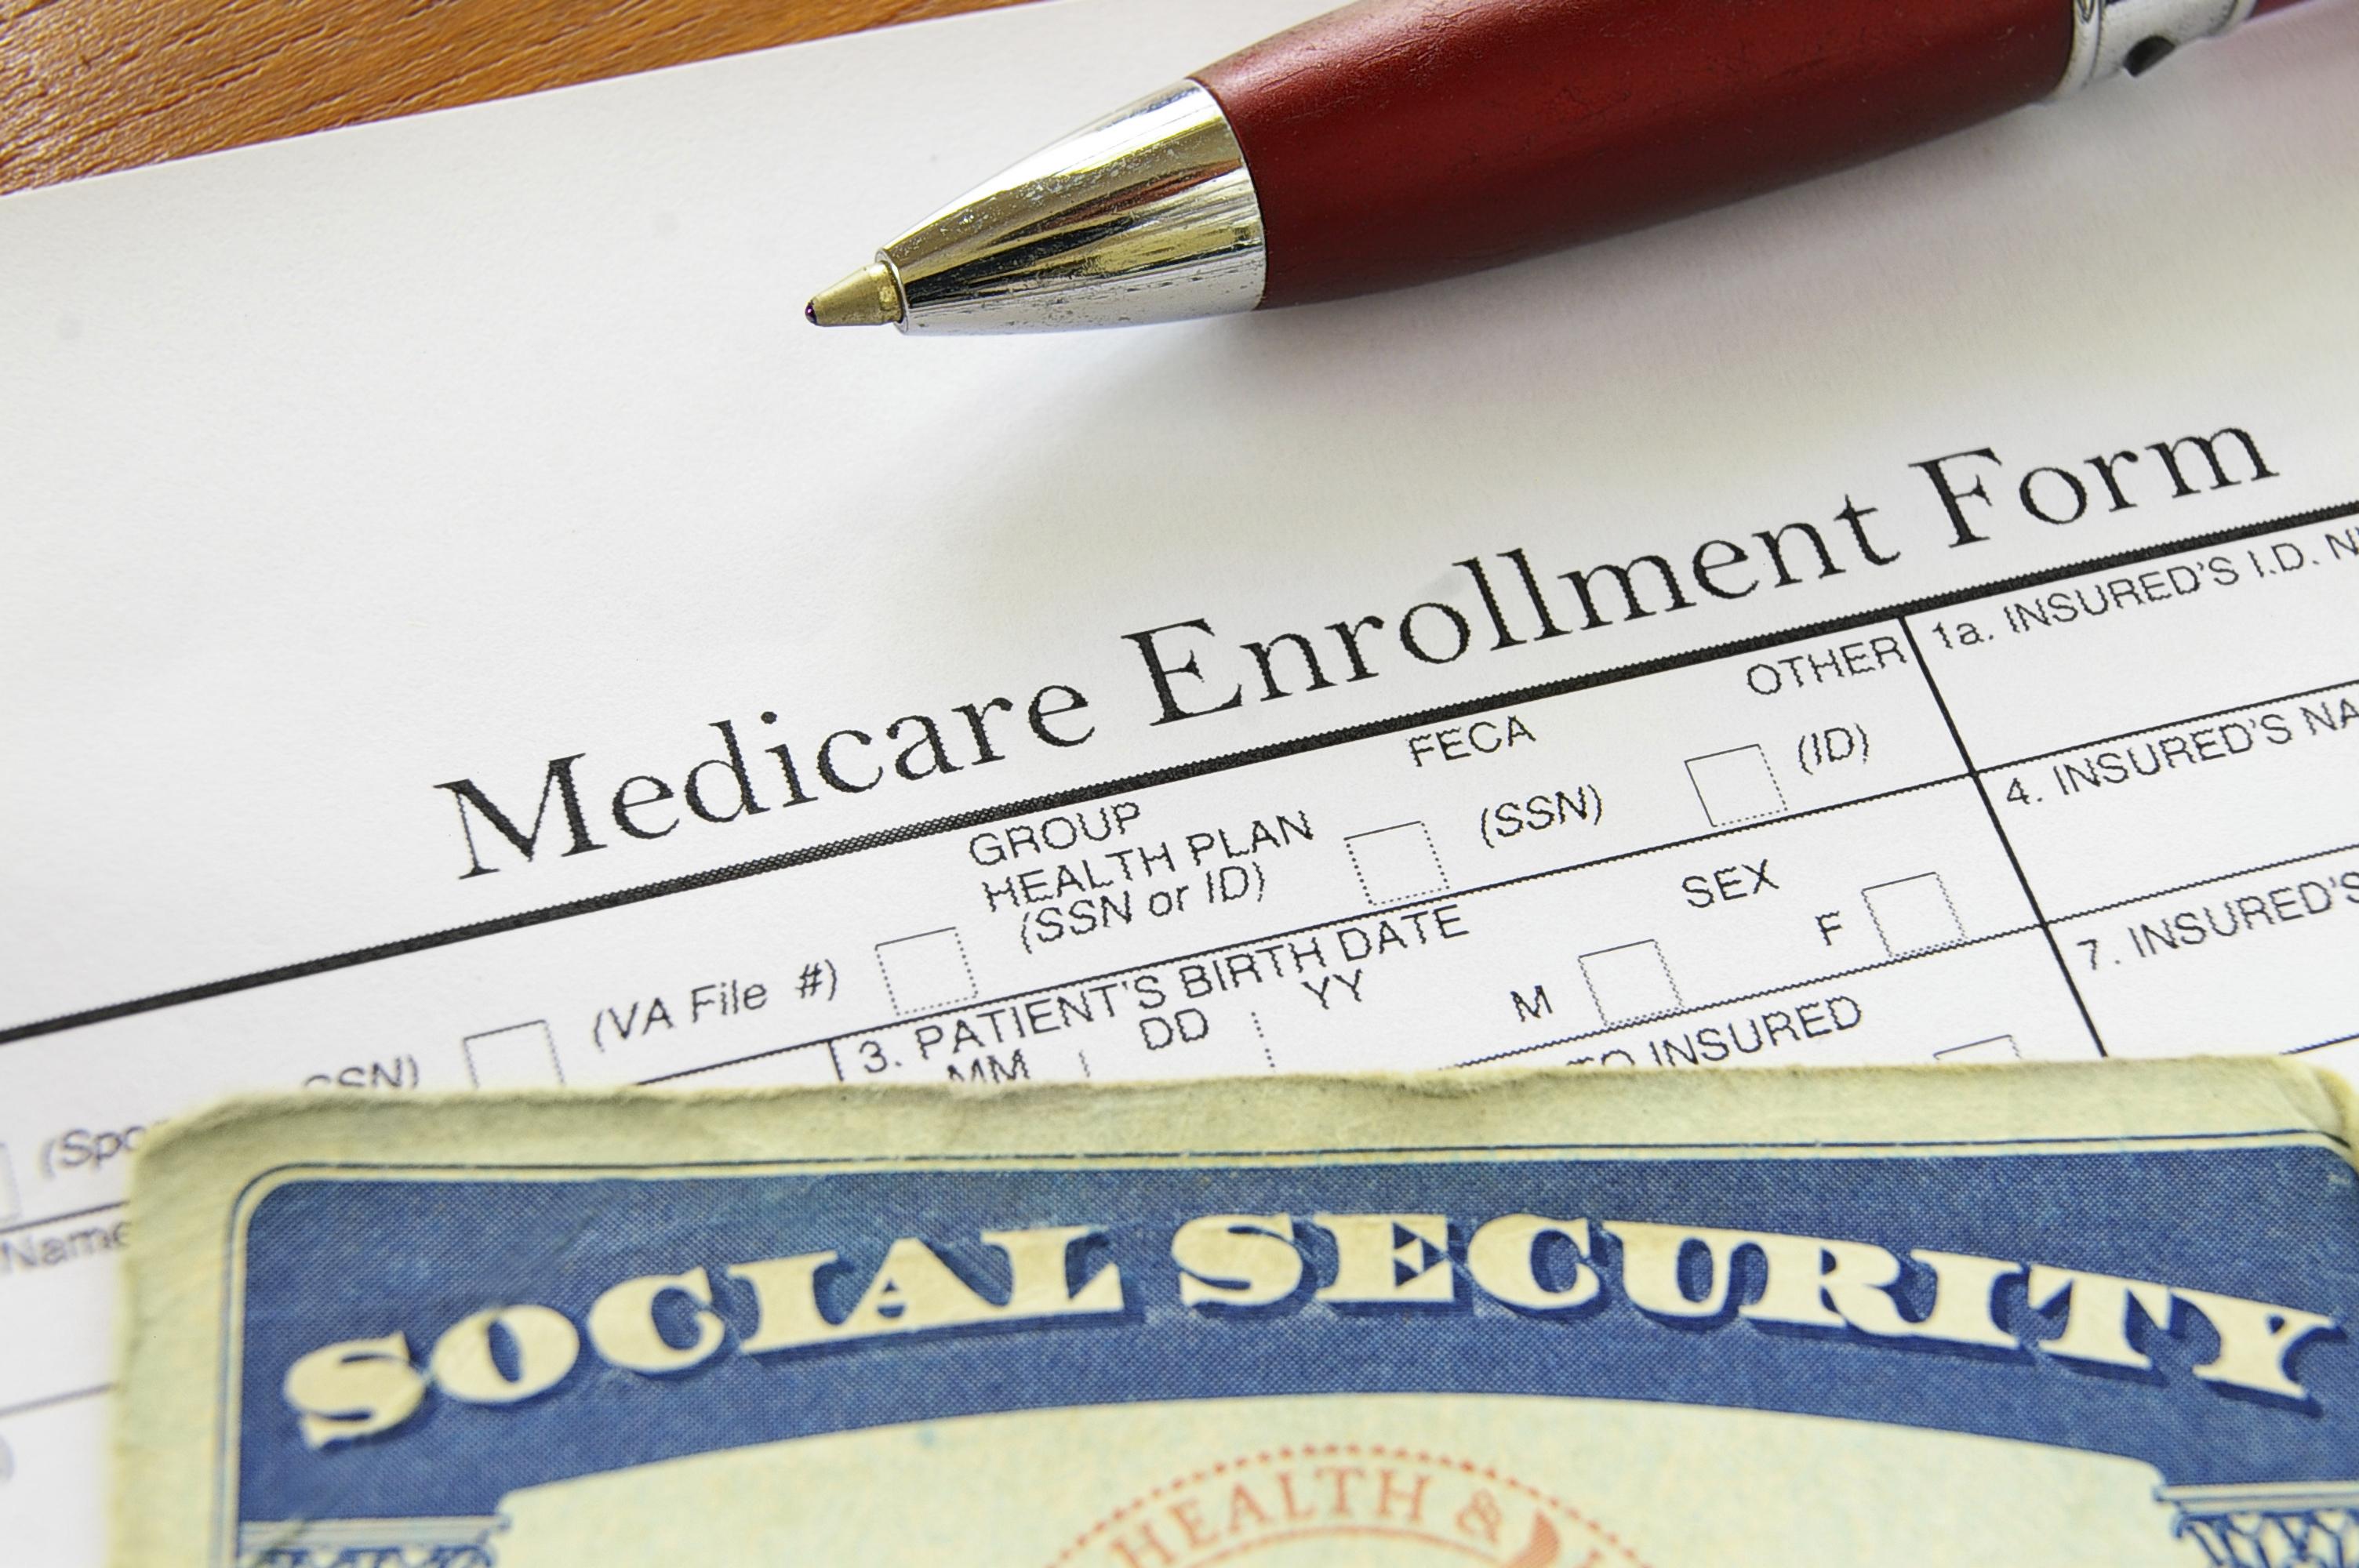 Social Security card on top of Medicare enrollment form.